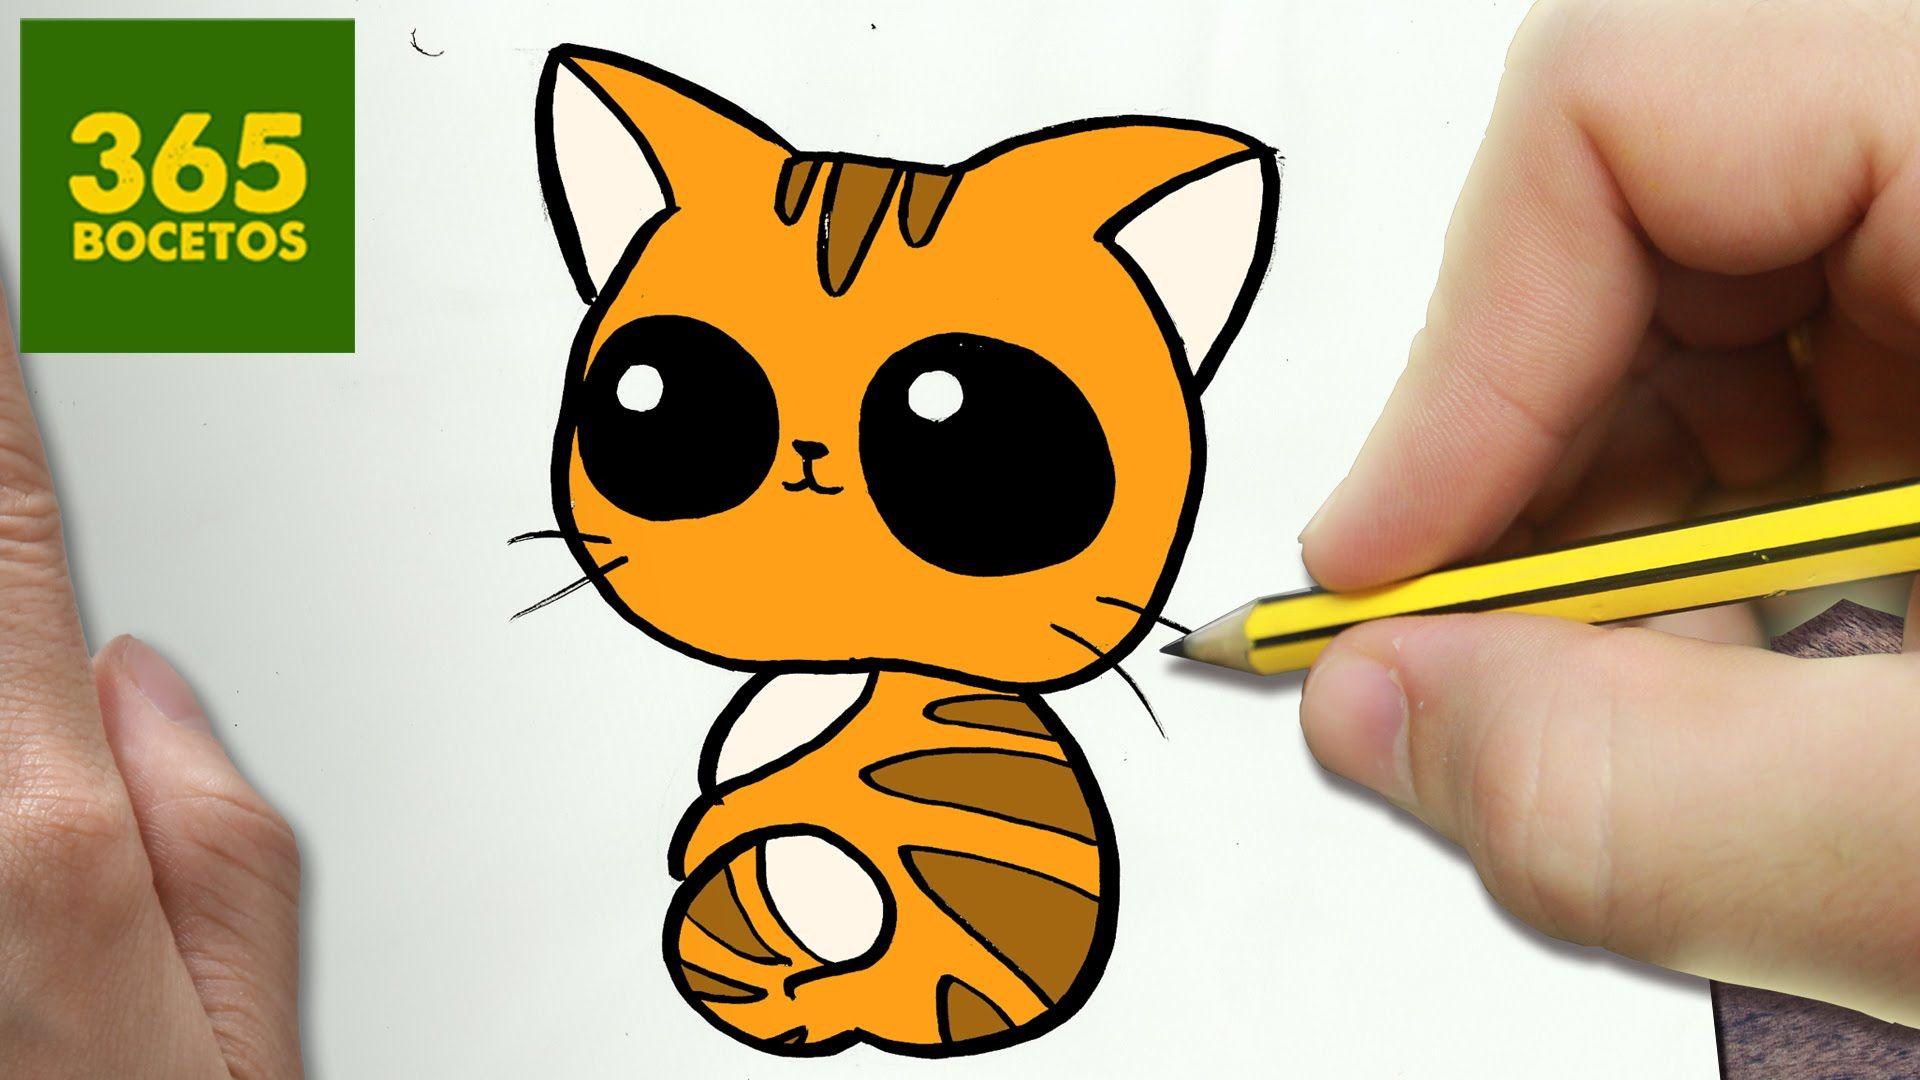 Como Dibujar Gato Kawaii Paso A Paso Dibujos Kawaii Faciles How To D Dibujos Kawaii Dibujos Kawaii Faciles Como Dibujar Un Gato